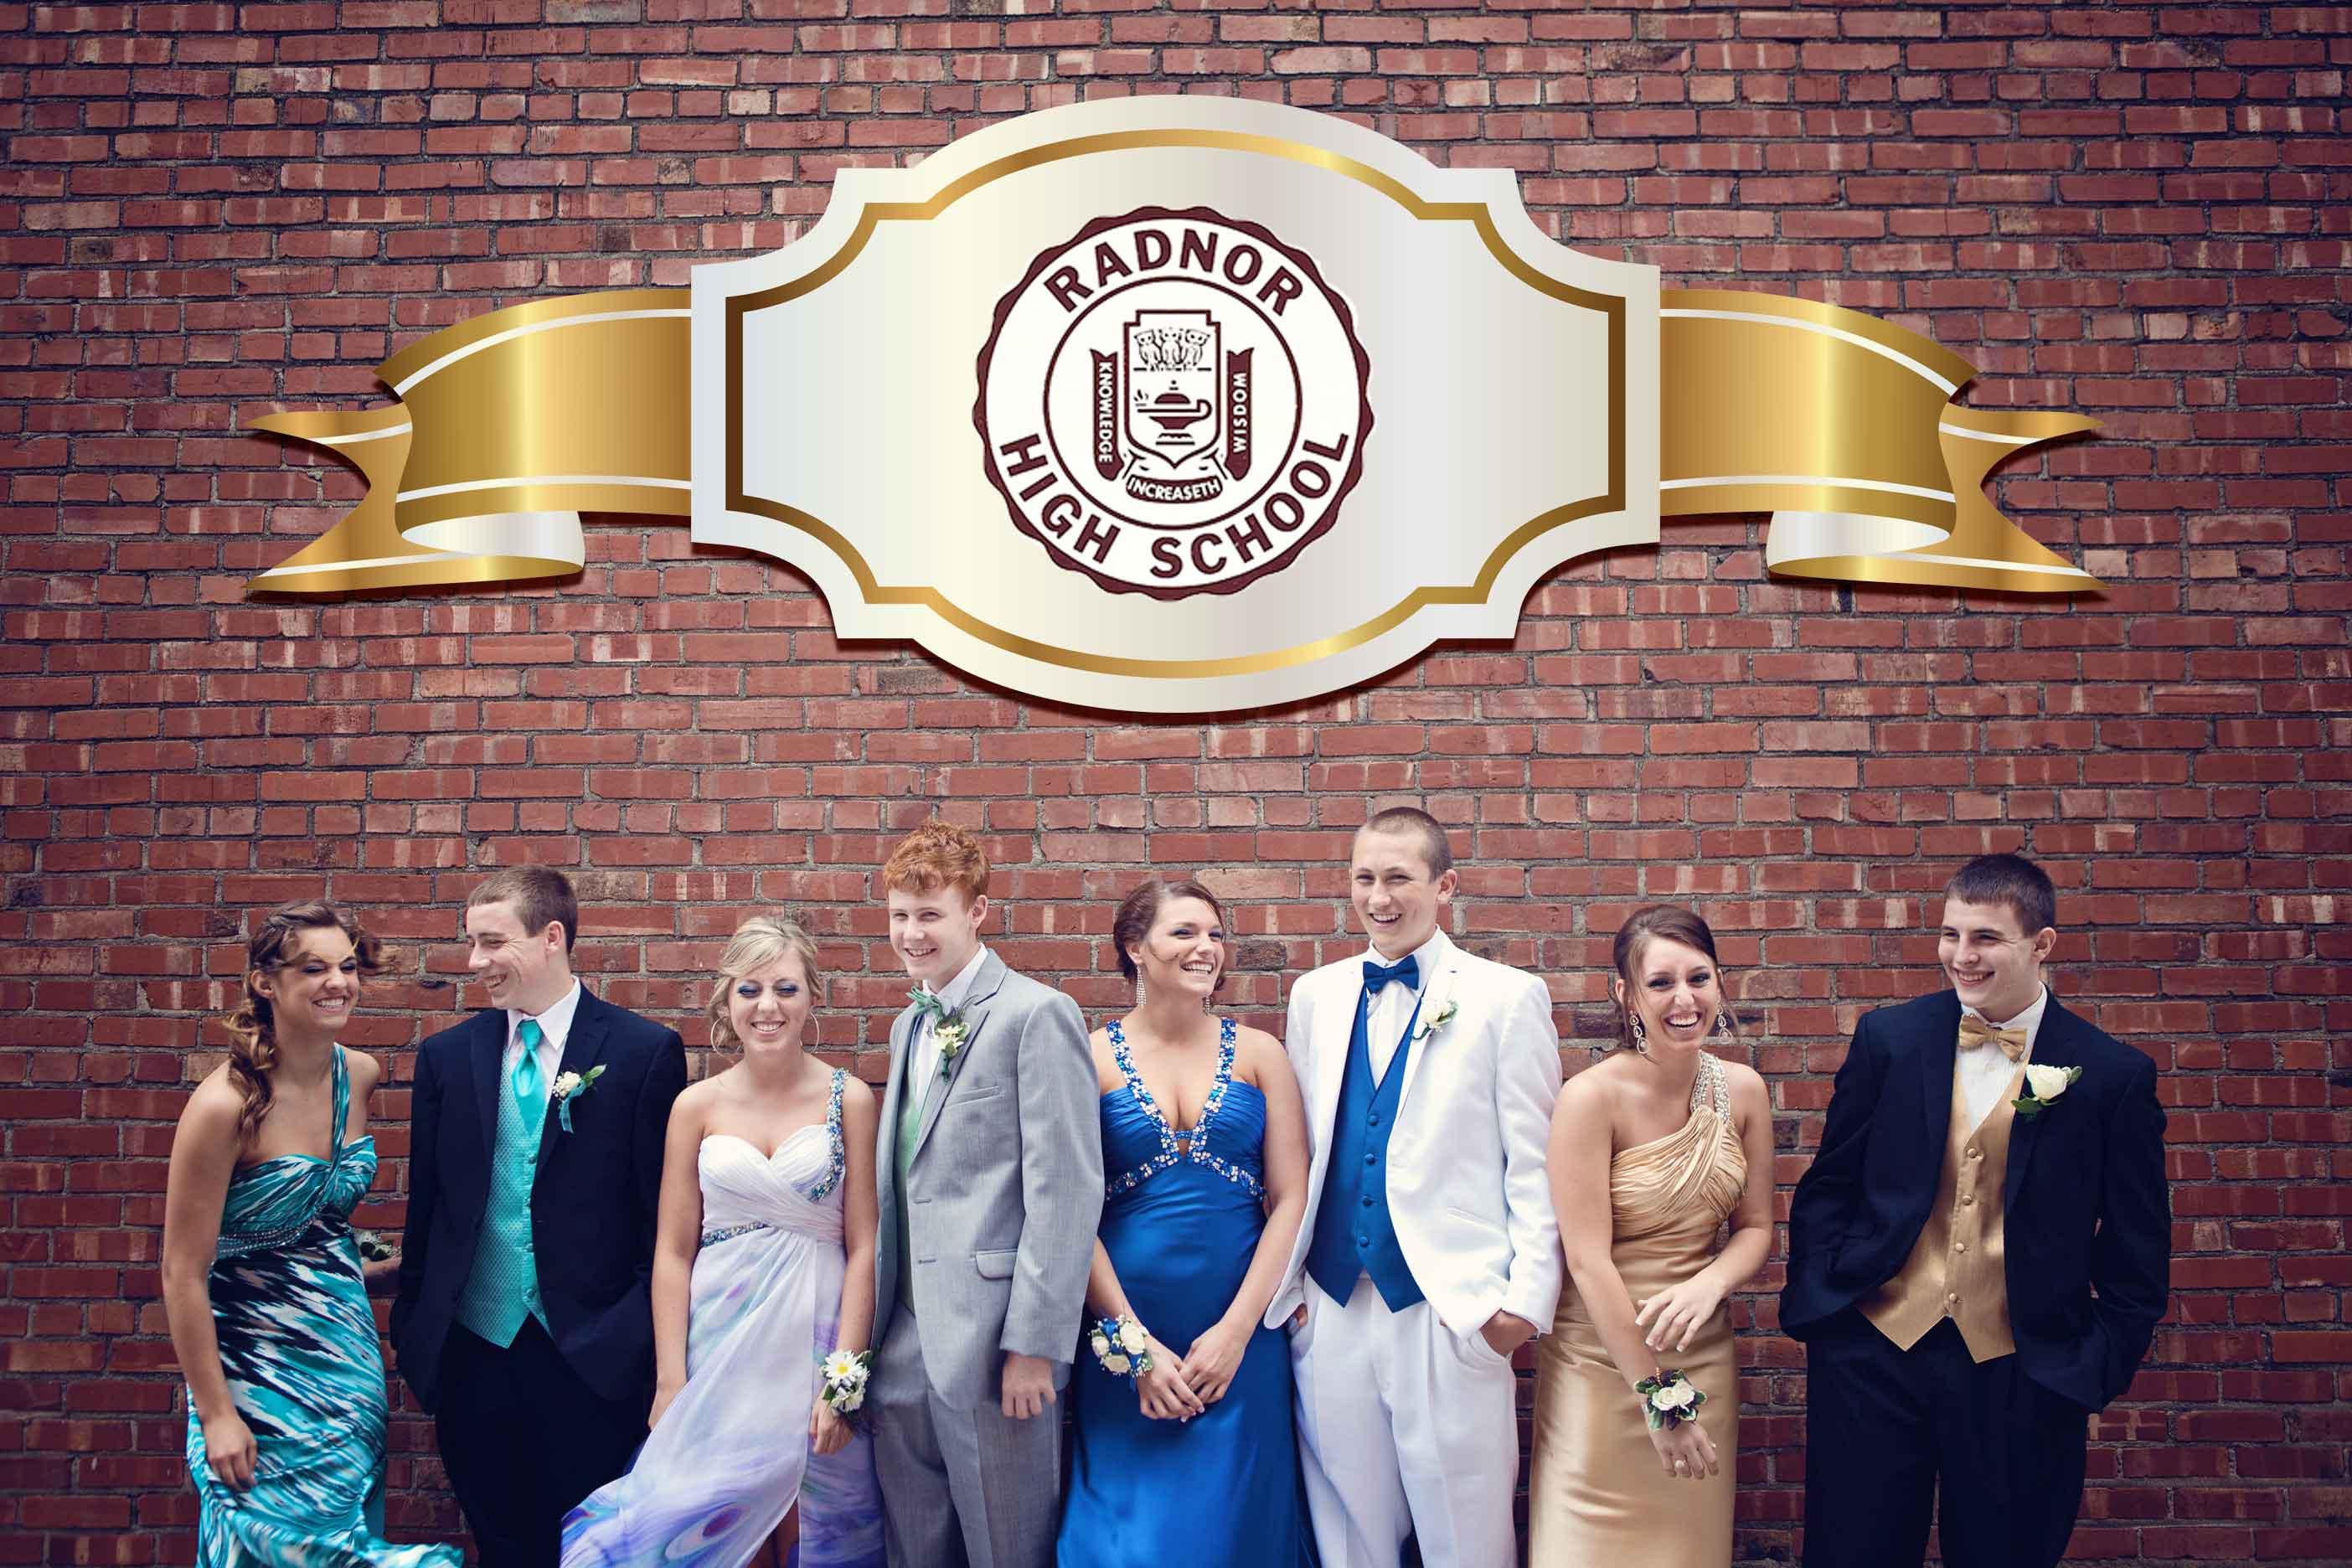 radnor high school prom